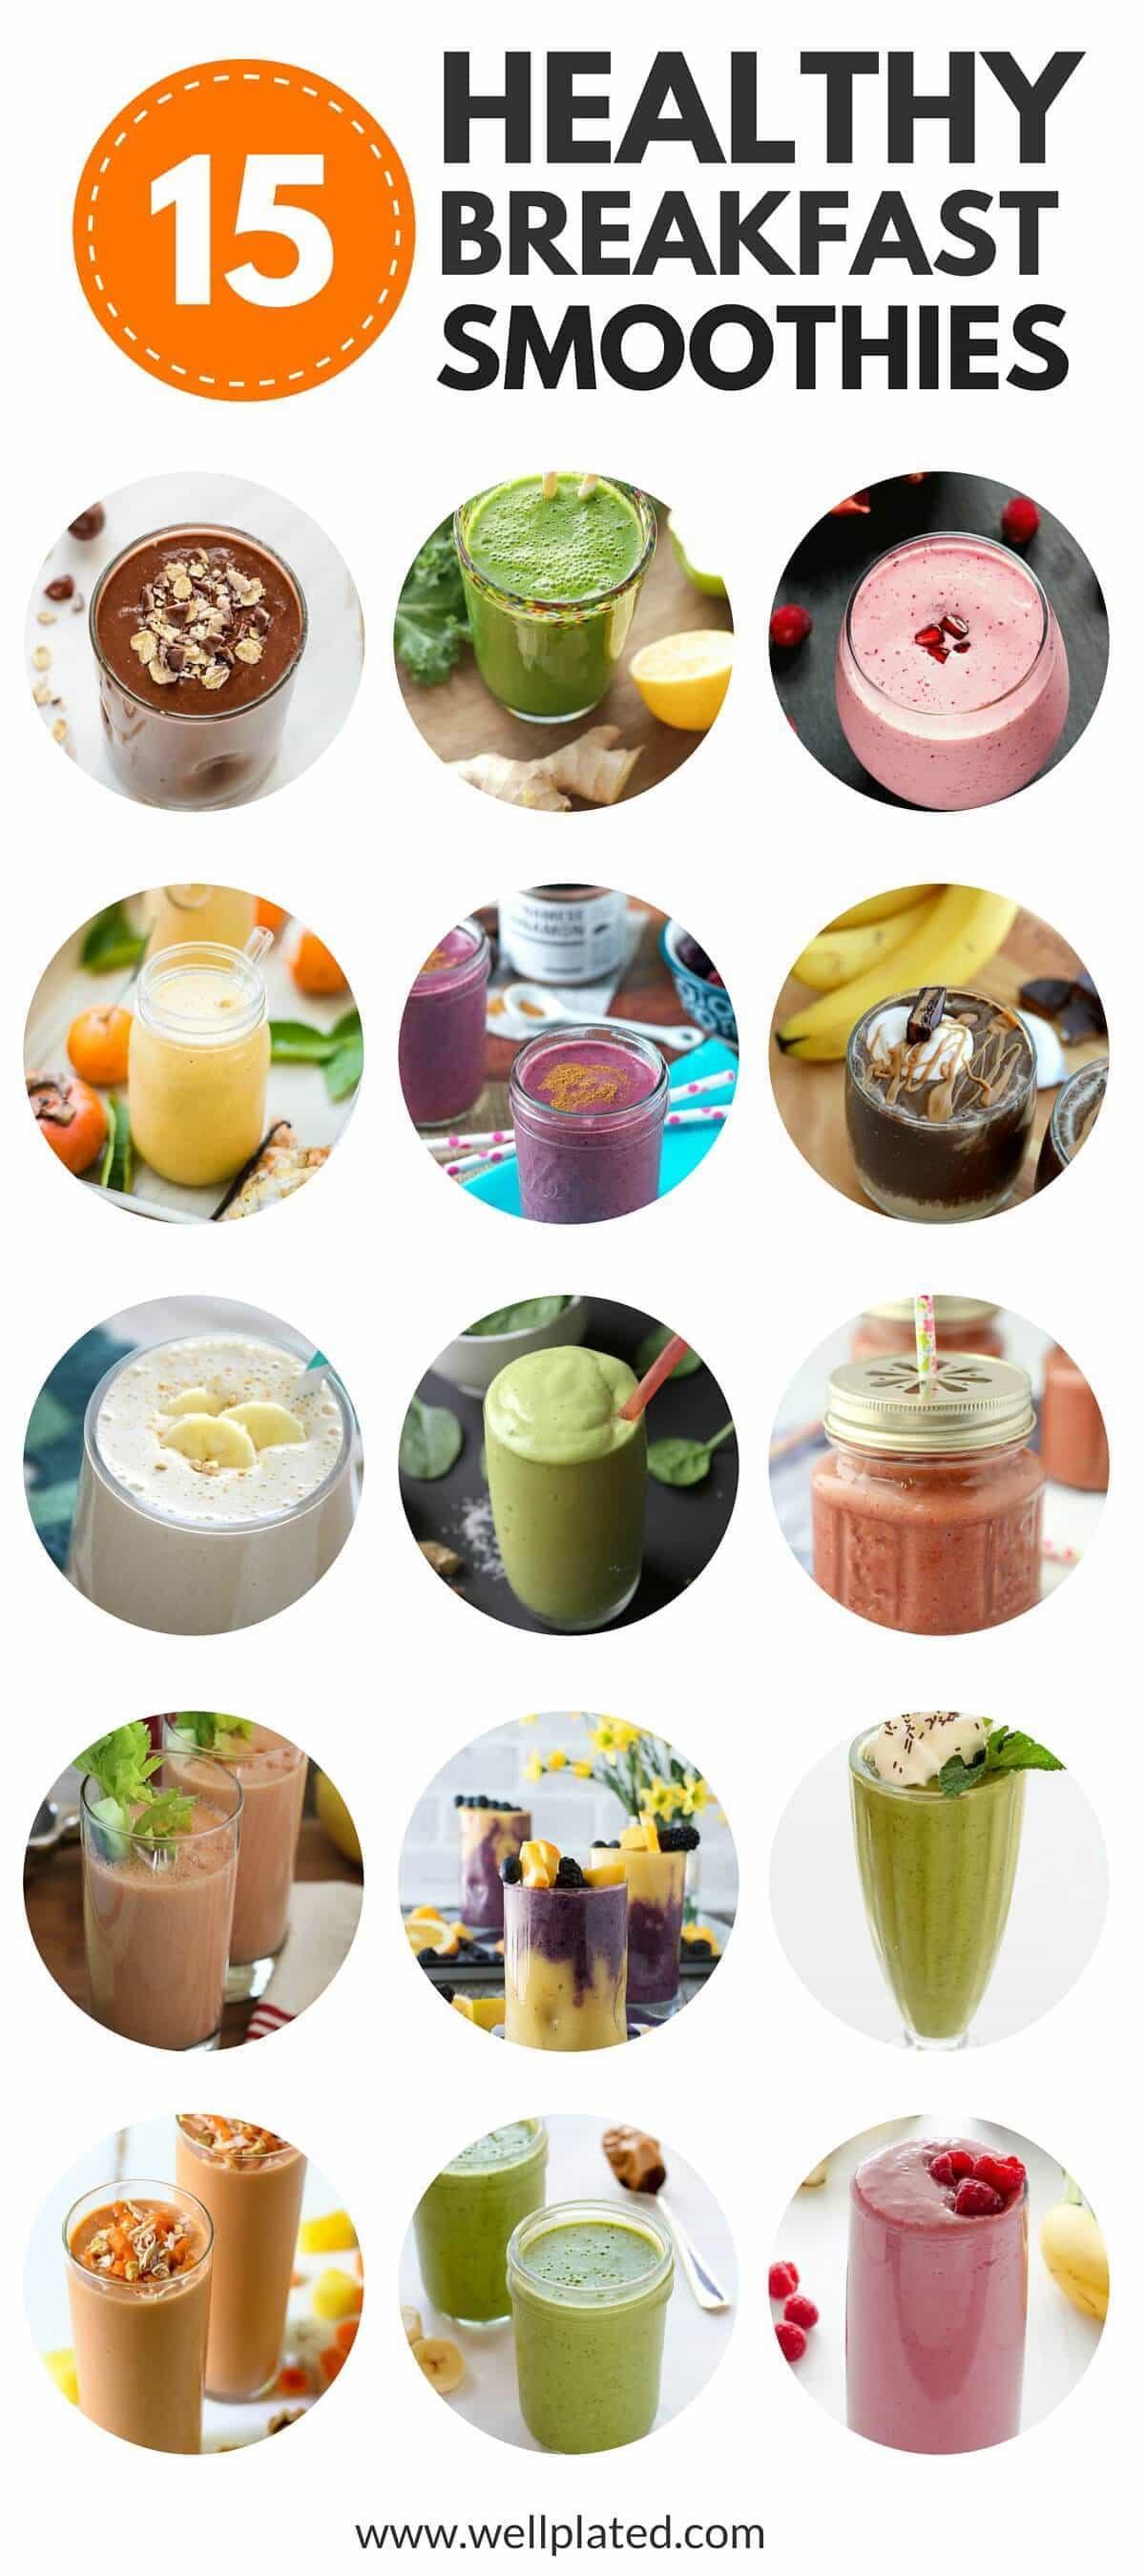 Good Breakfast Smoothies  The Best 15 Healthy Breakfast Smoothies